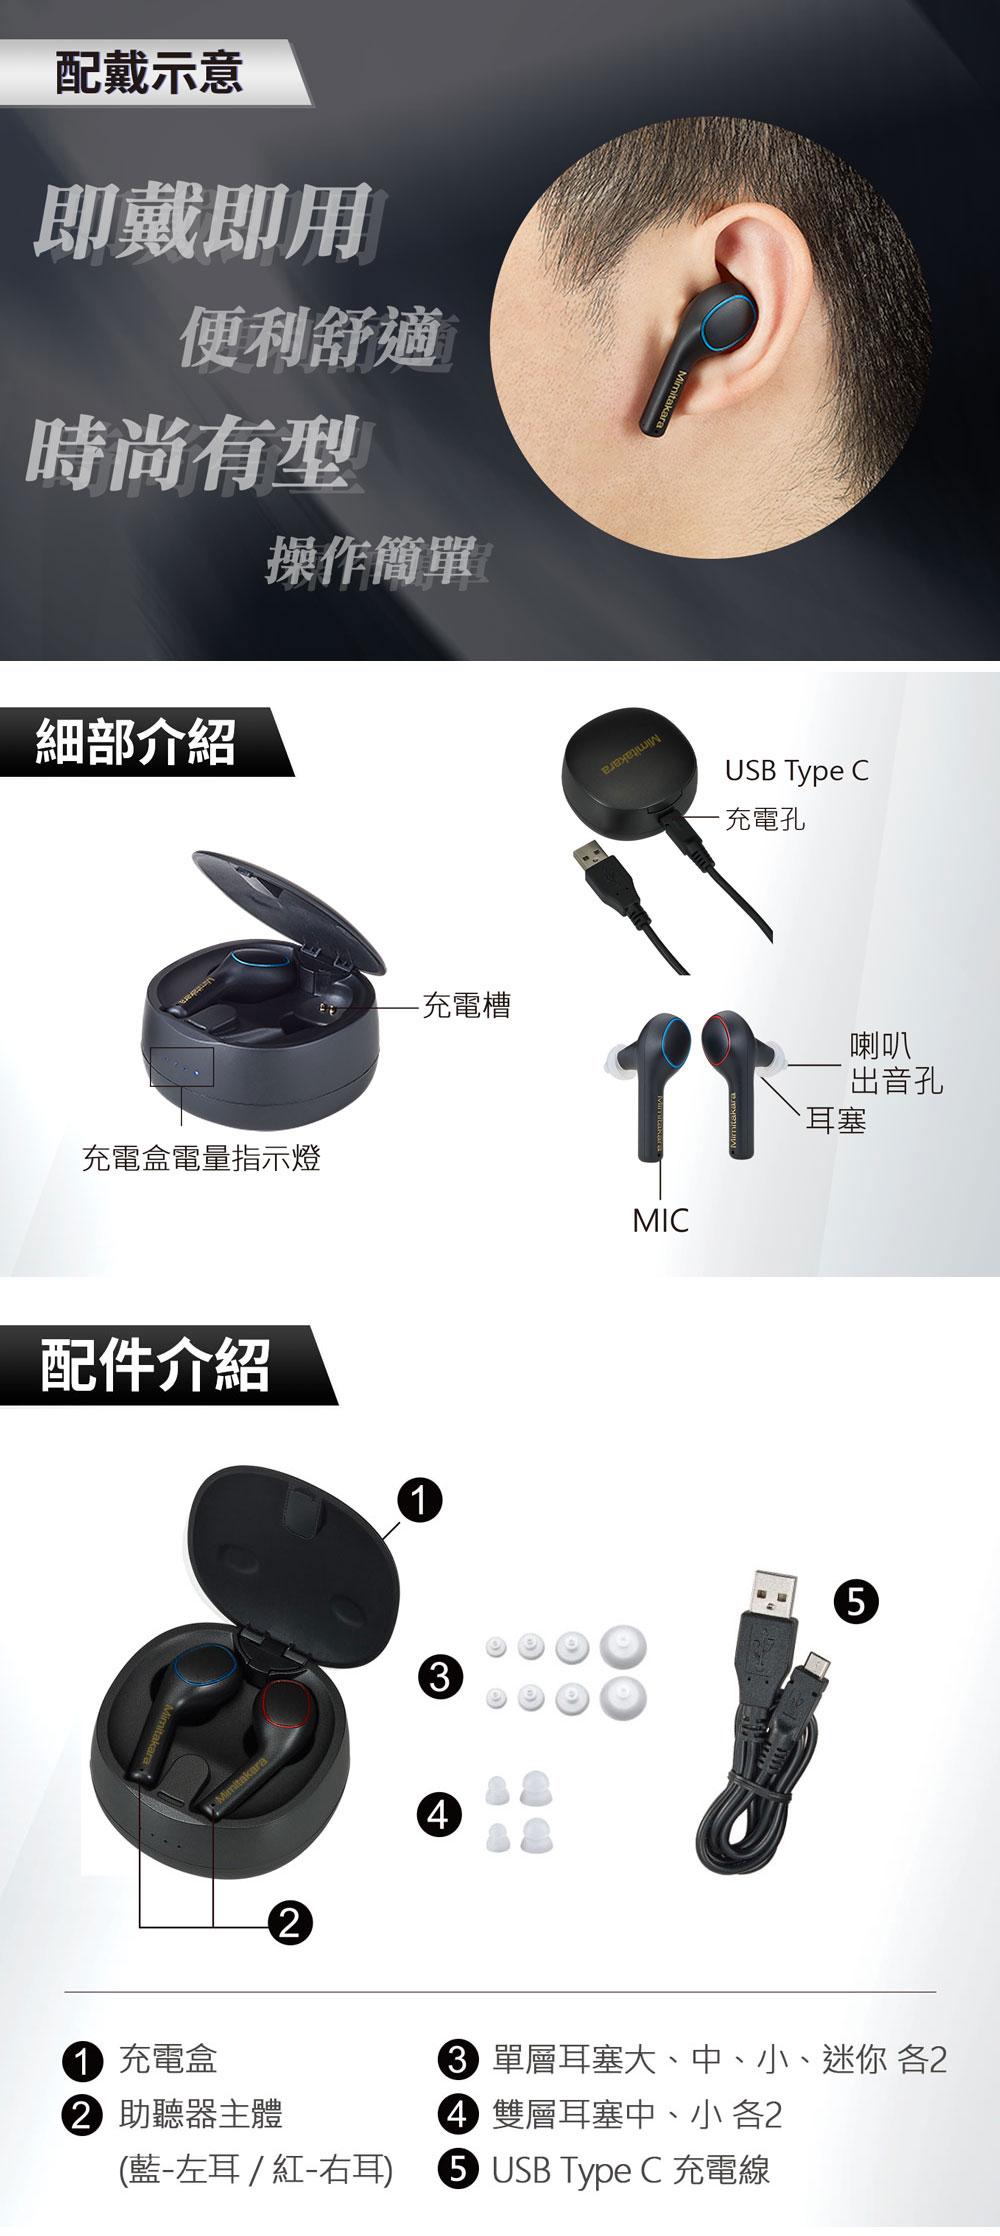 耳寶,6EL,補助資訊,助聽器